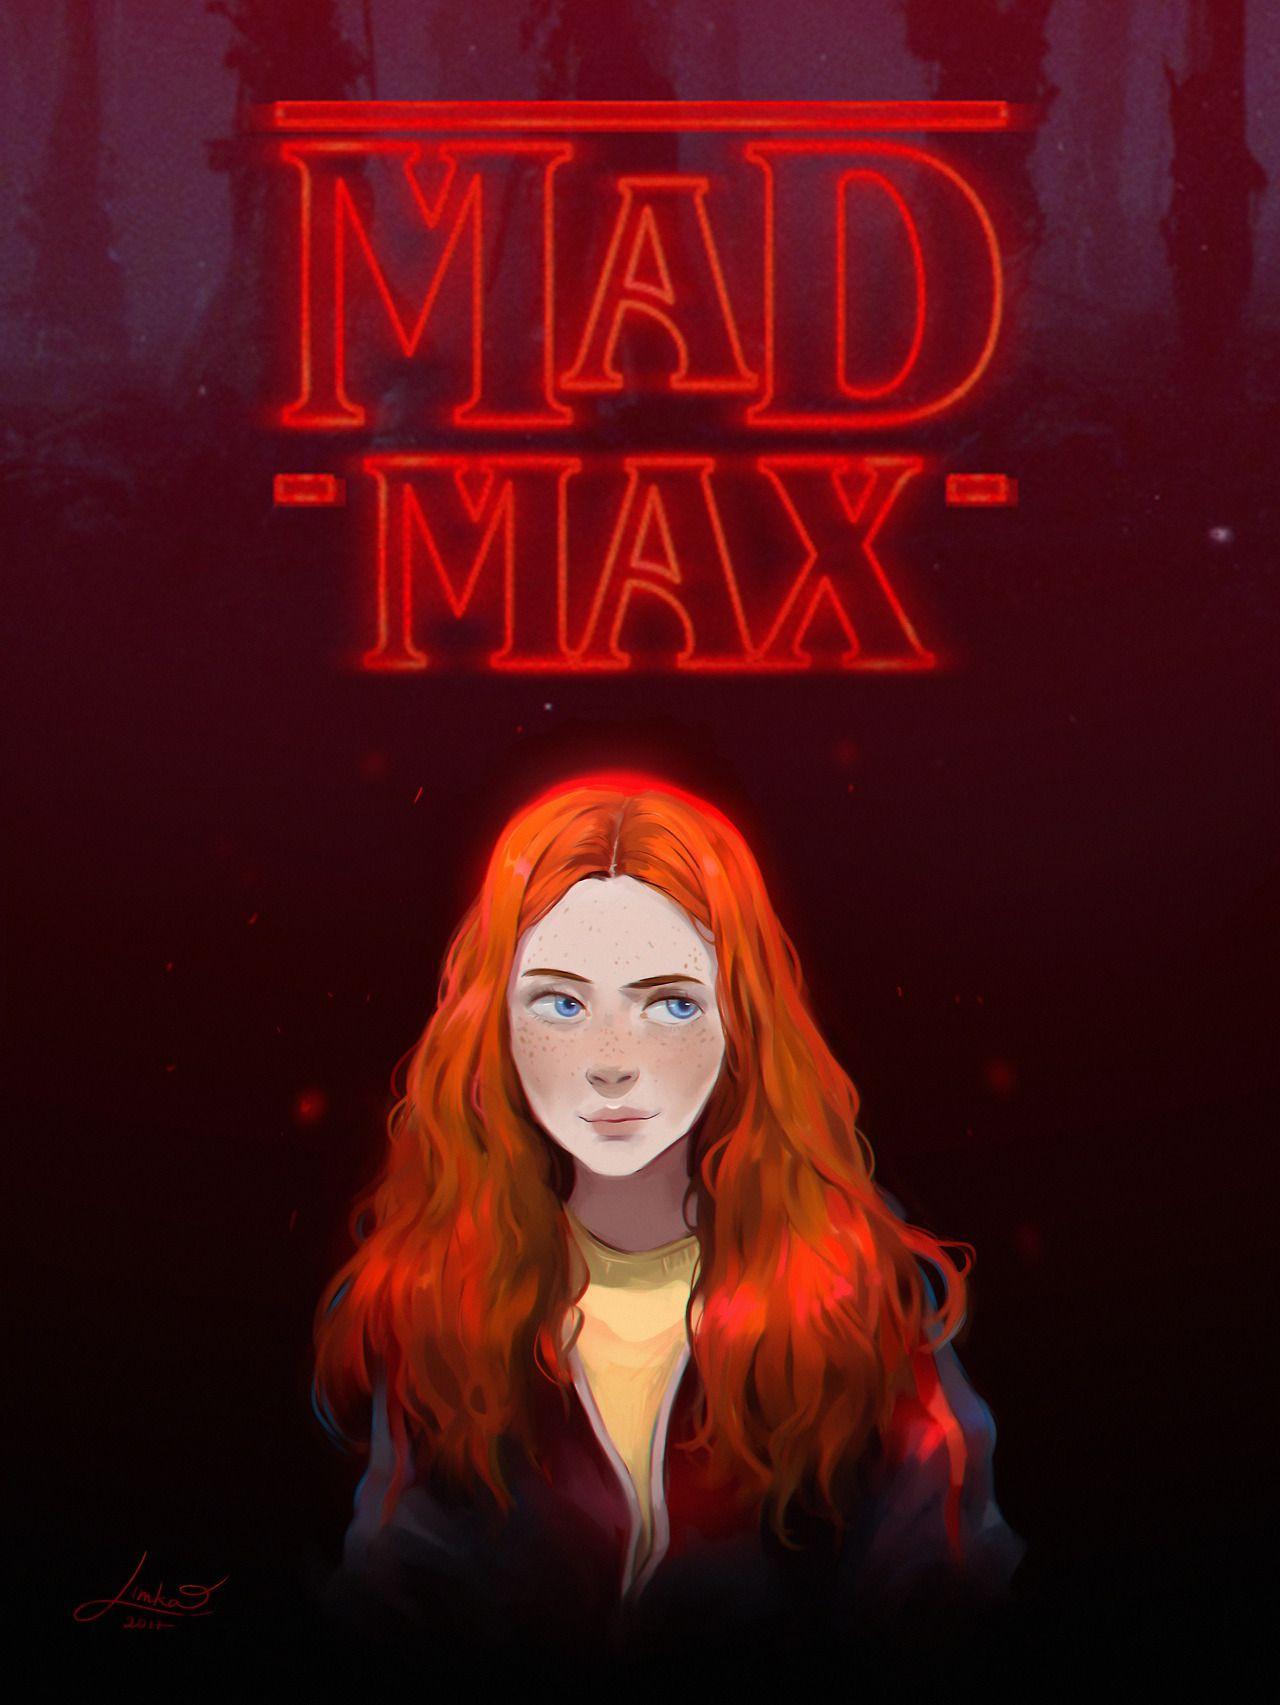 Mad Max Art By Limka Chan On Tumblr Stranger Things